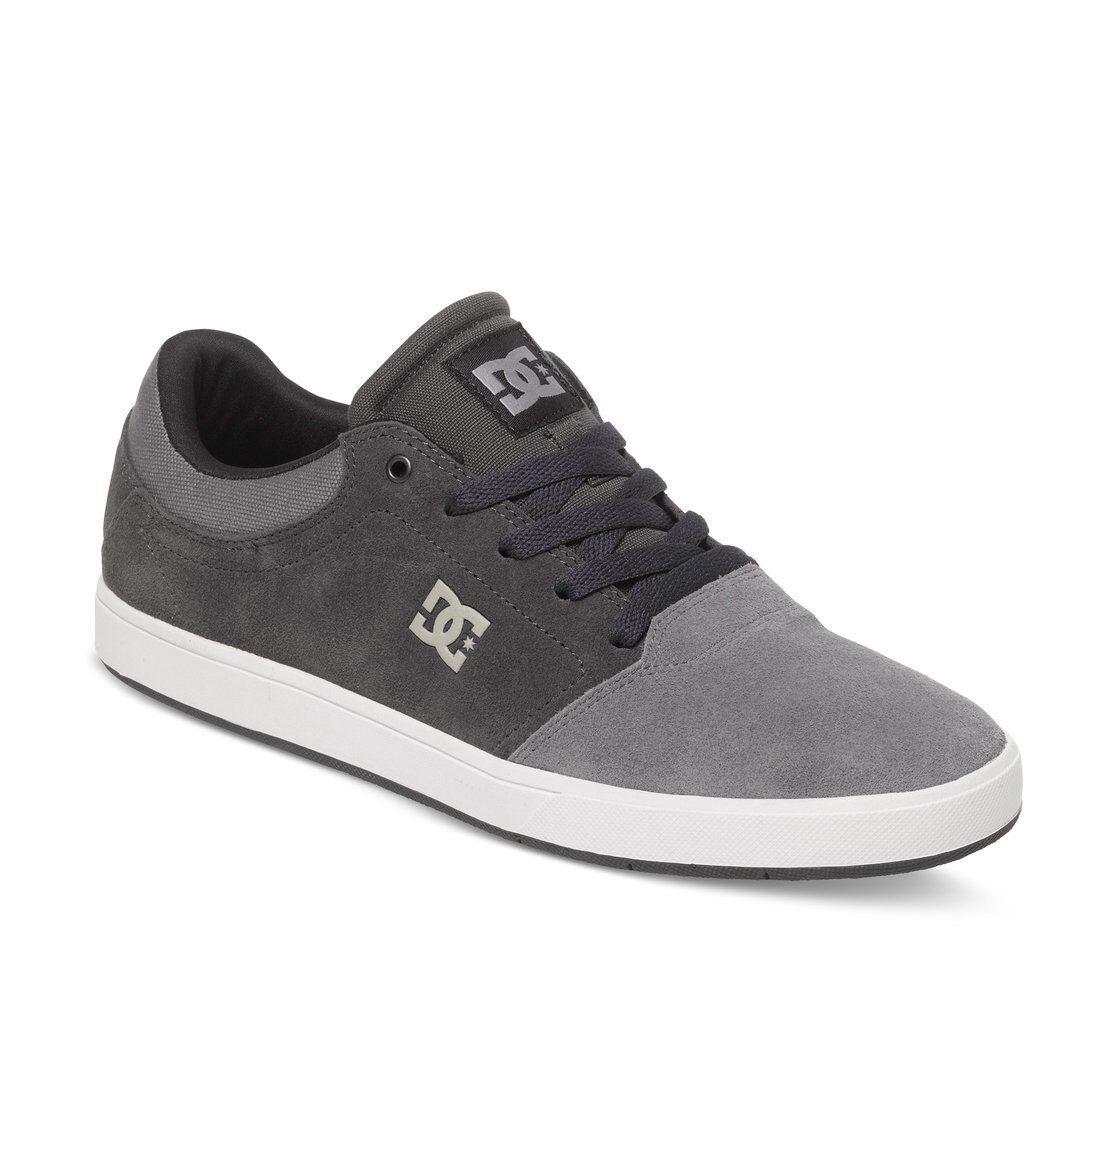 Dc crisi carbone skateboard scarpe 100029 uomini